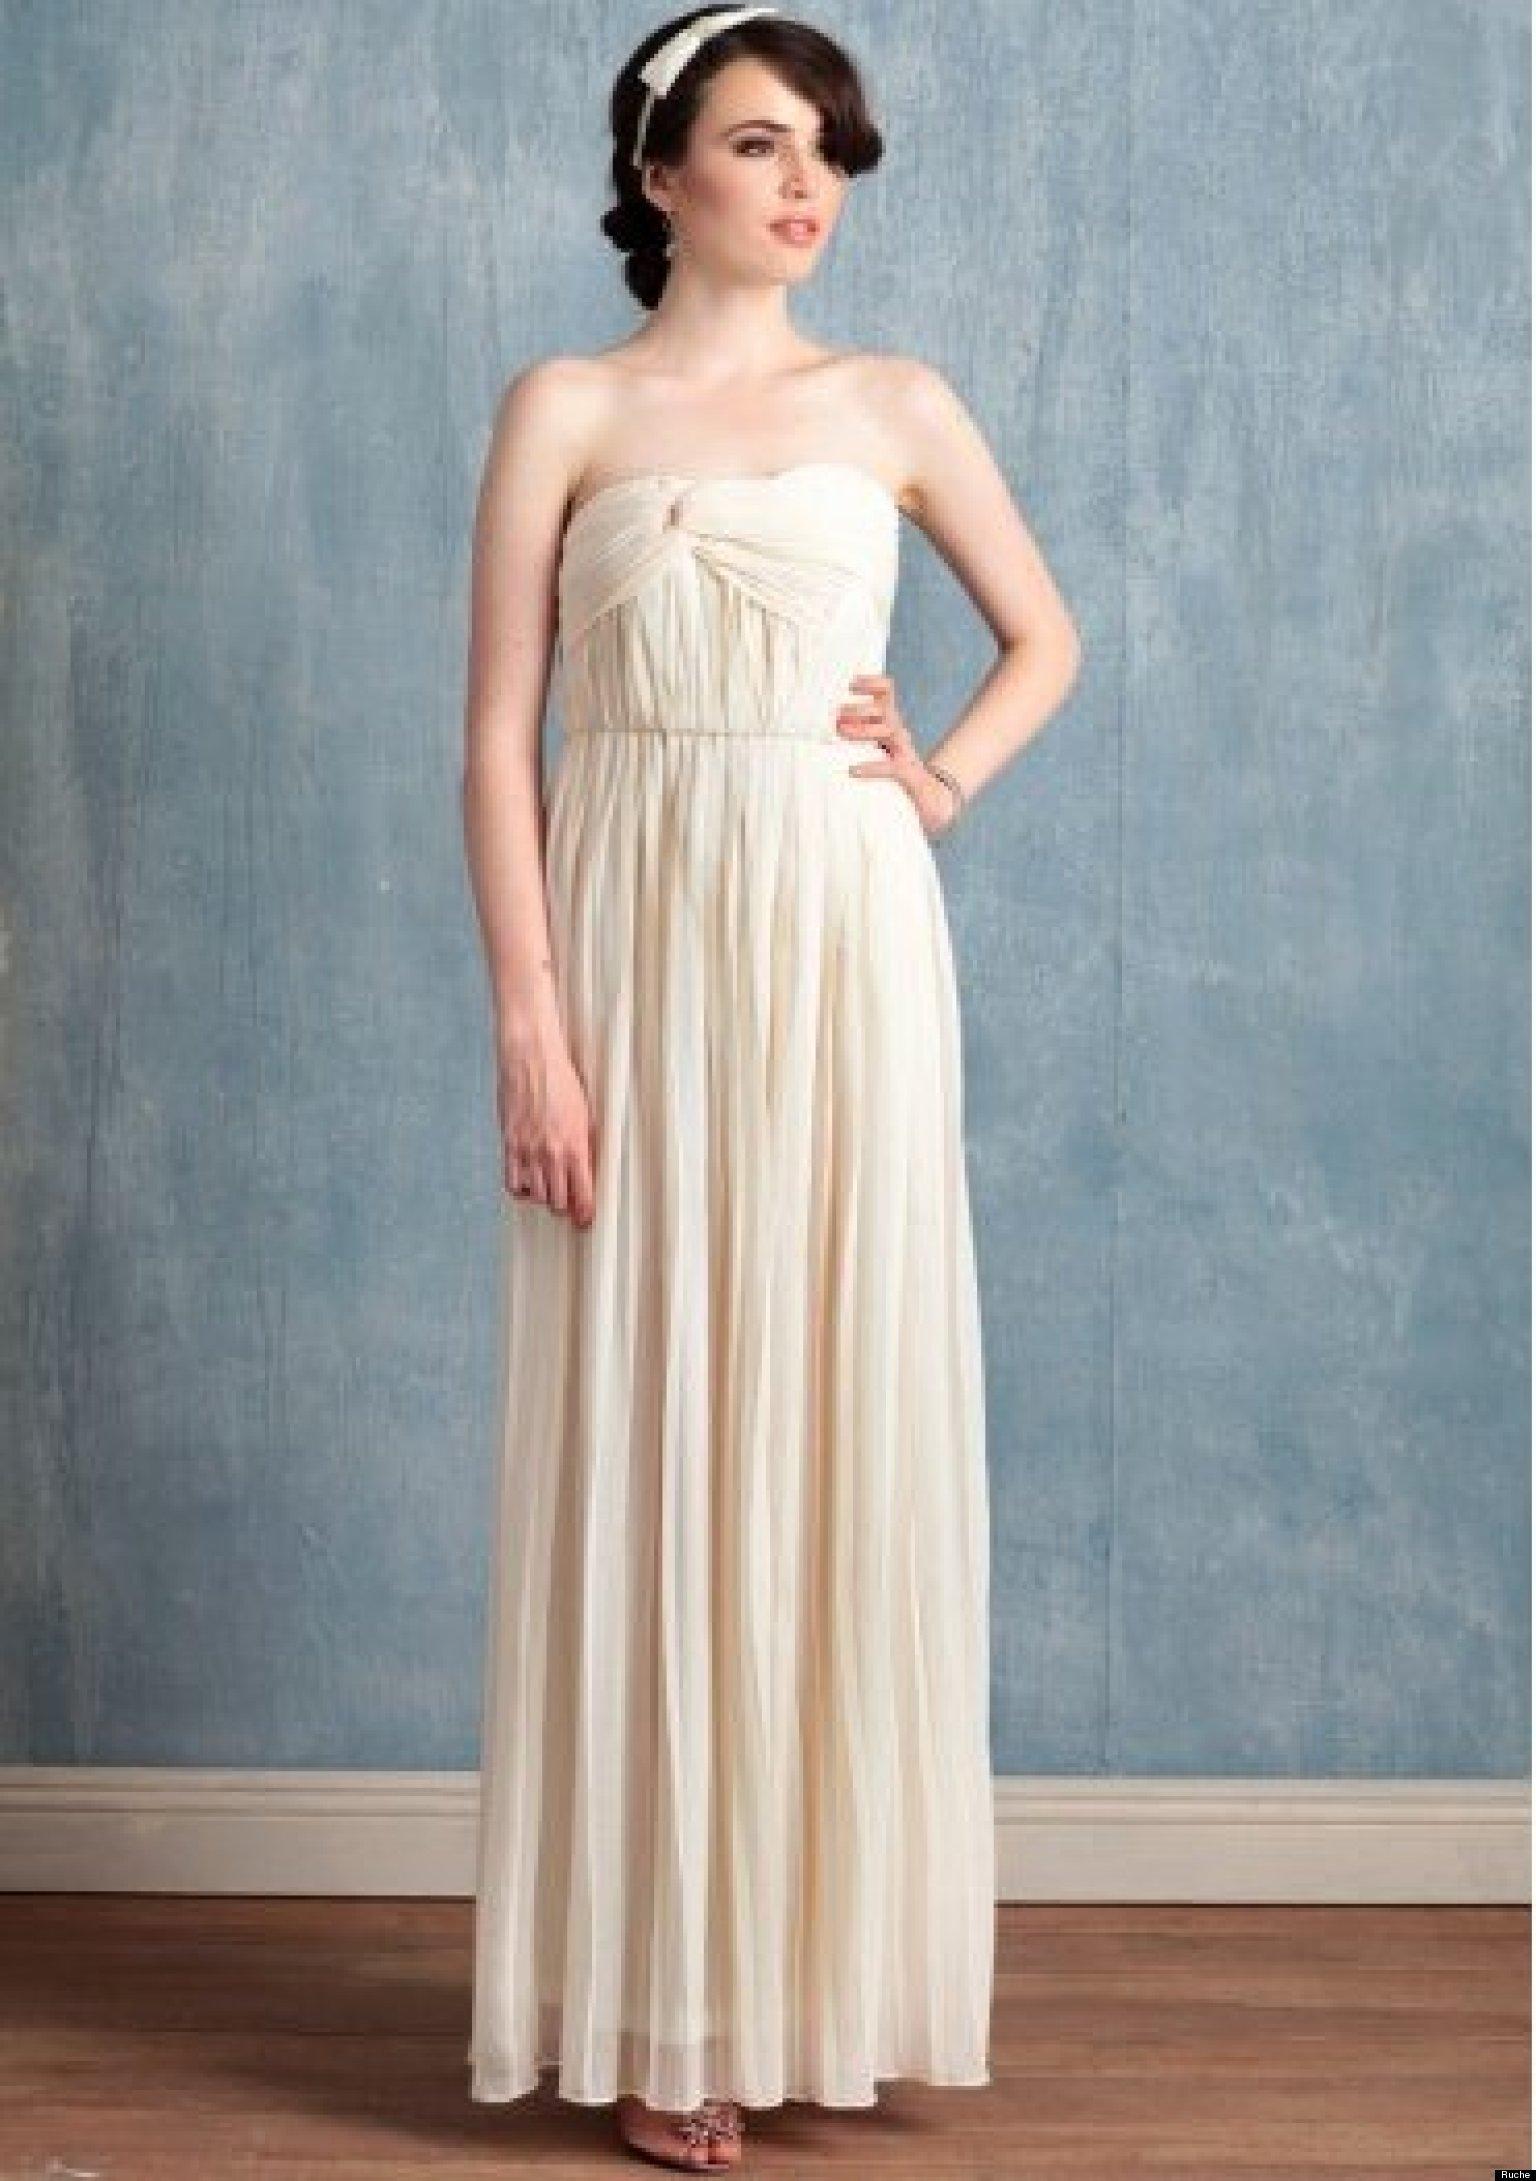 cheap wedding dresses n inexpensive wedding dresses Cheap Wedding Dresses Stylish Gowns For Less Than PHOTOS HuffPost